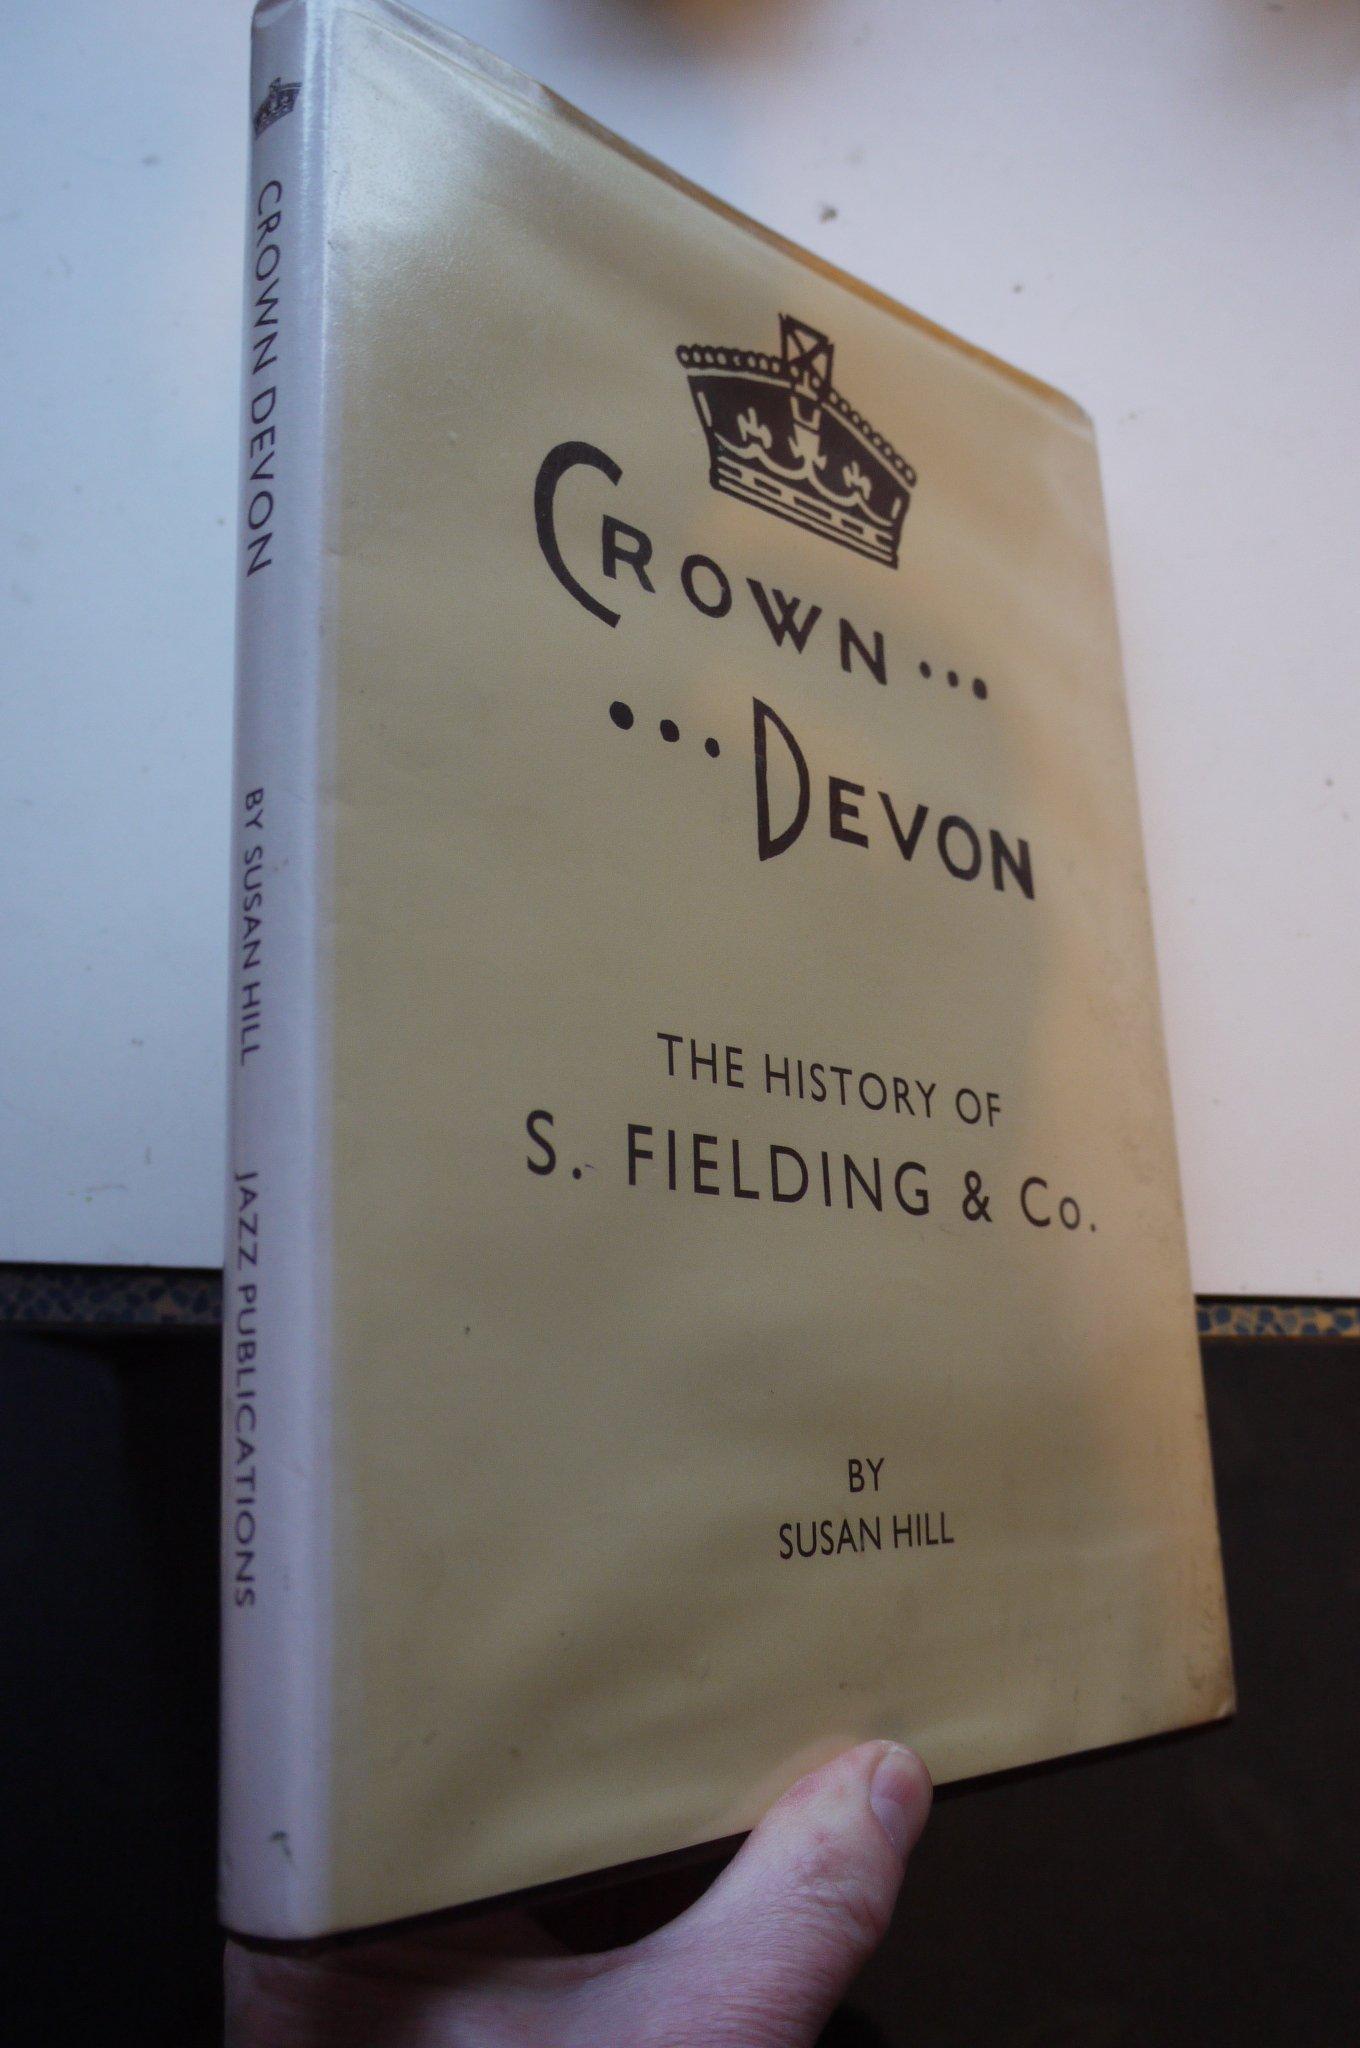 crown devon the history of sfielding co